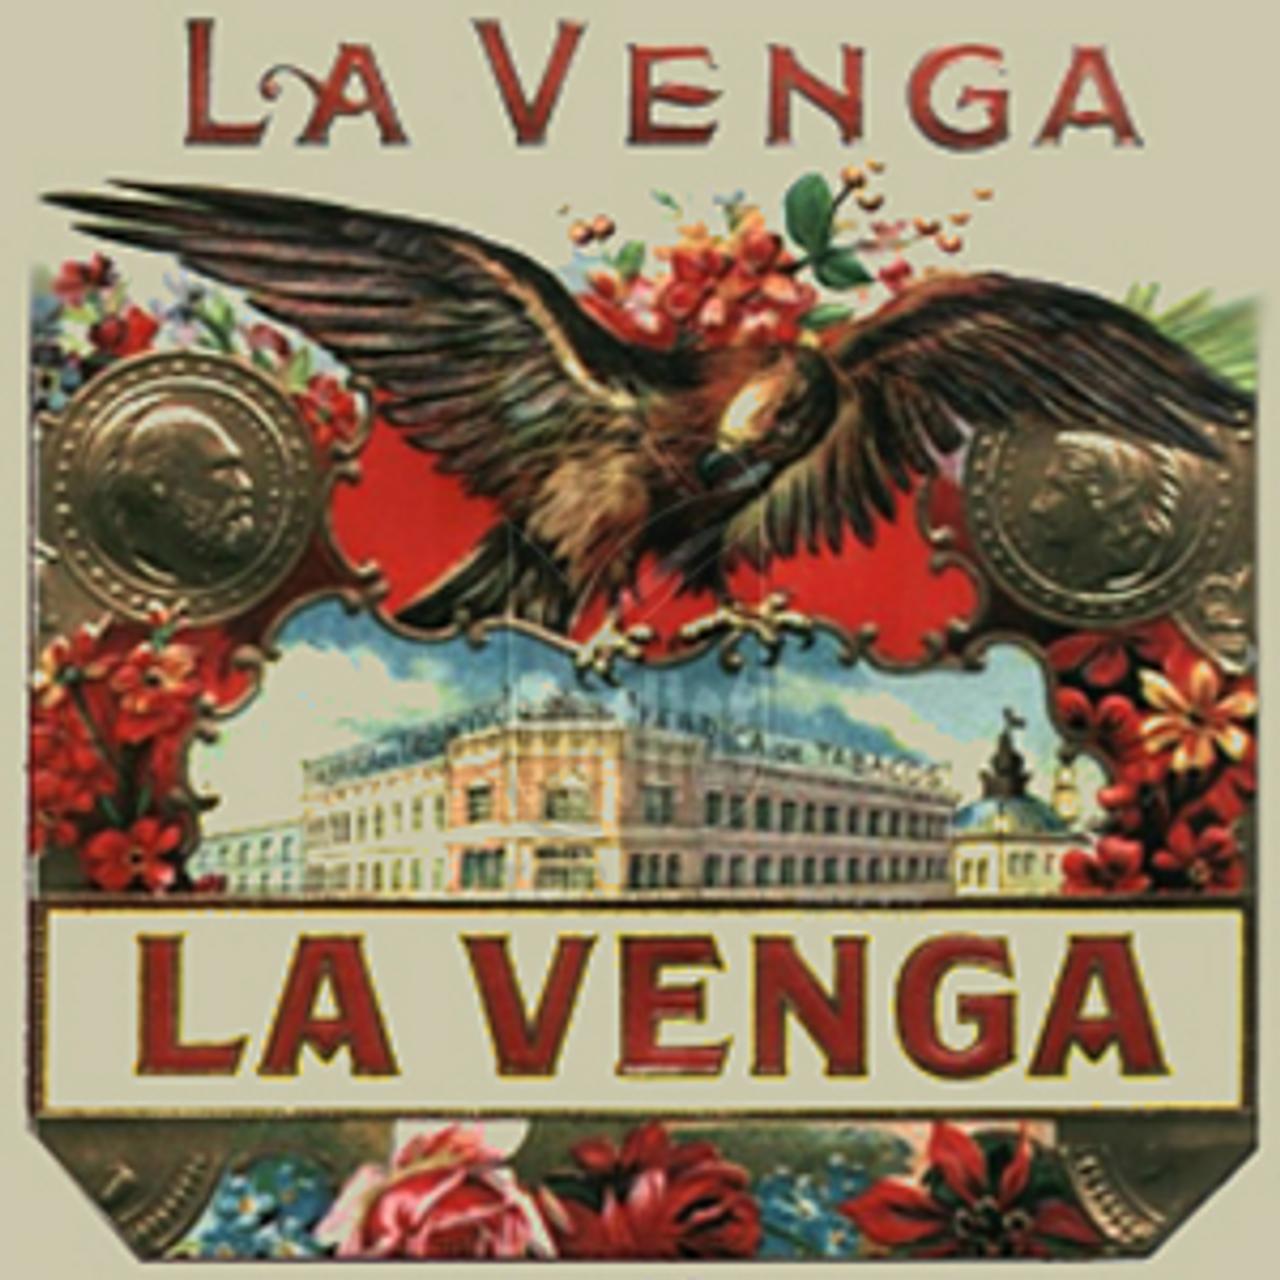 La Venga No.75 Maduro Cigars - 6 x 60 (Bundle of 20)